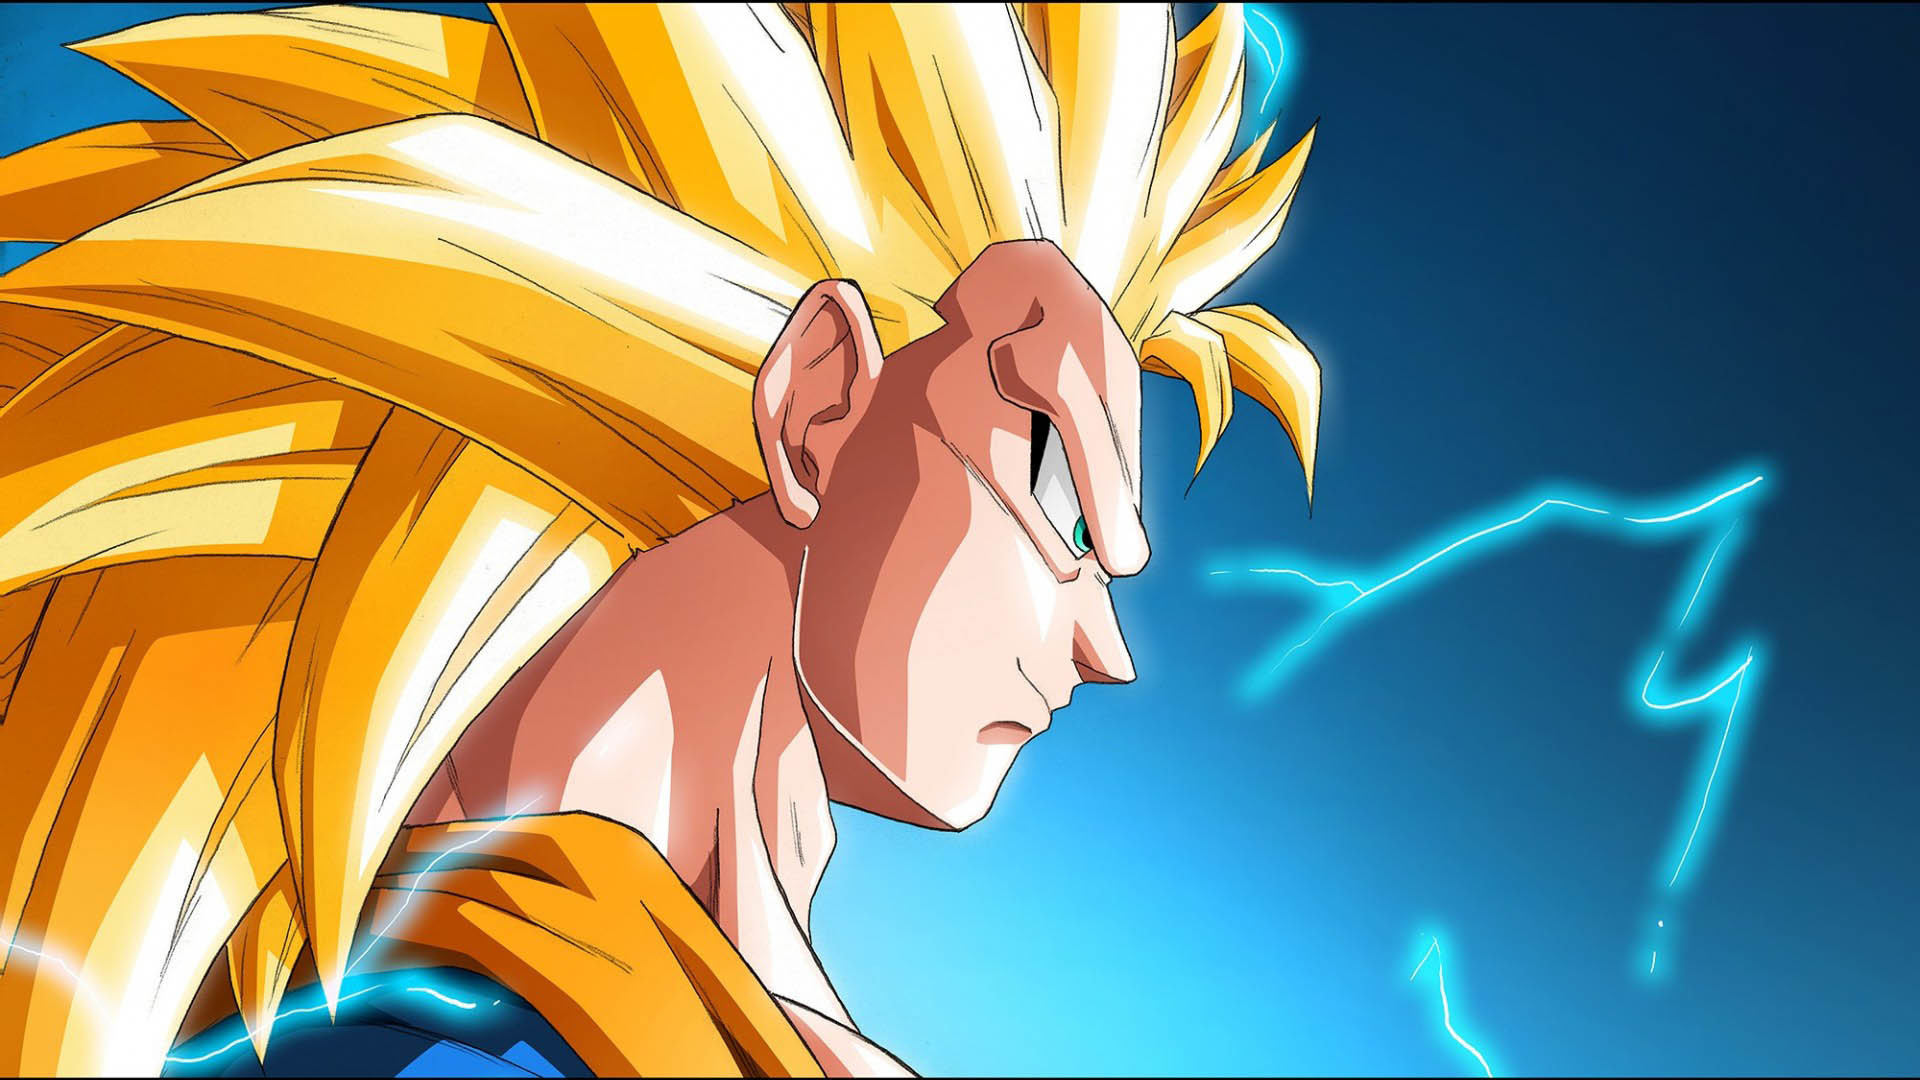 Son Goku Super Saiyan 3 wallpaper